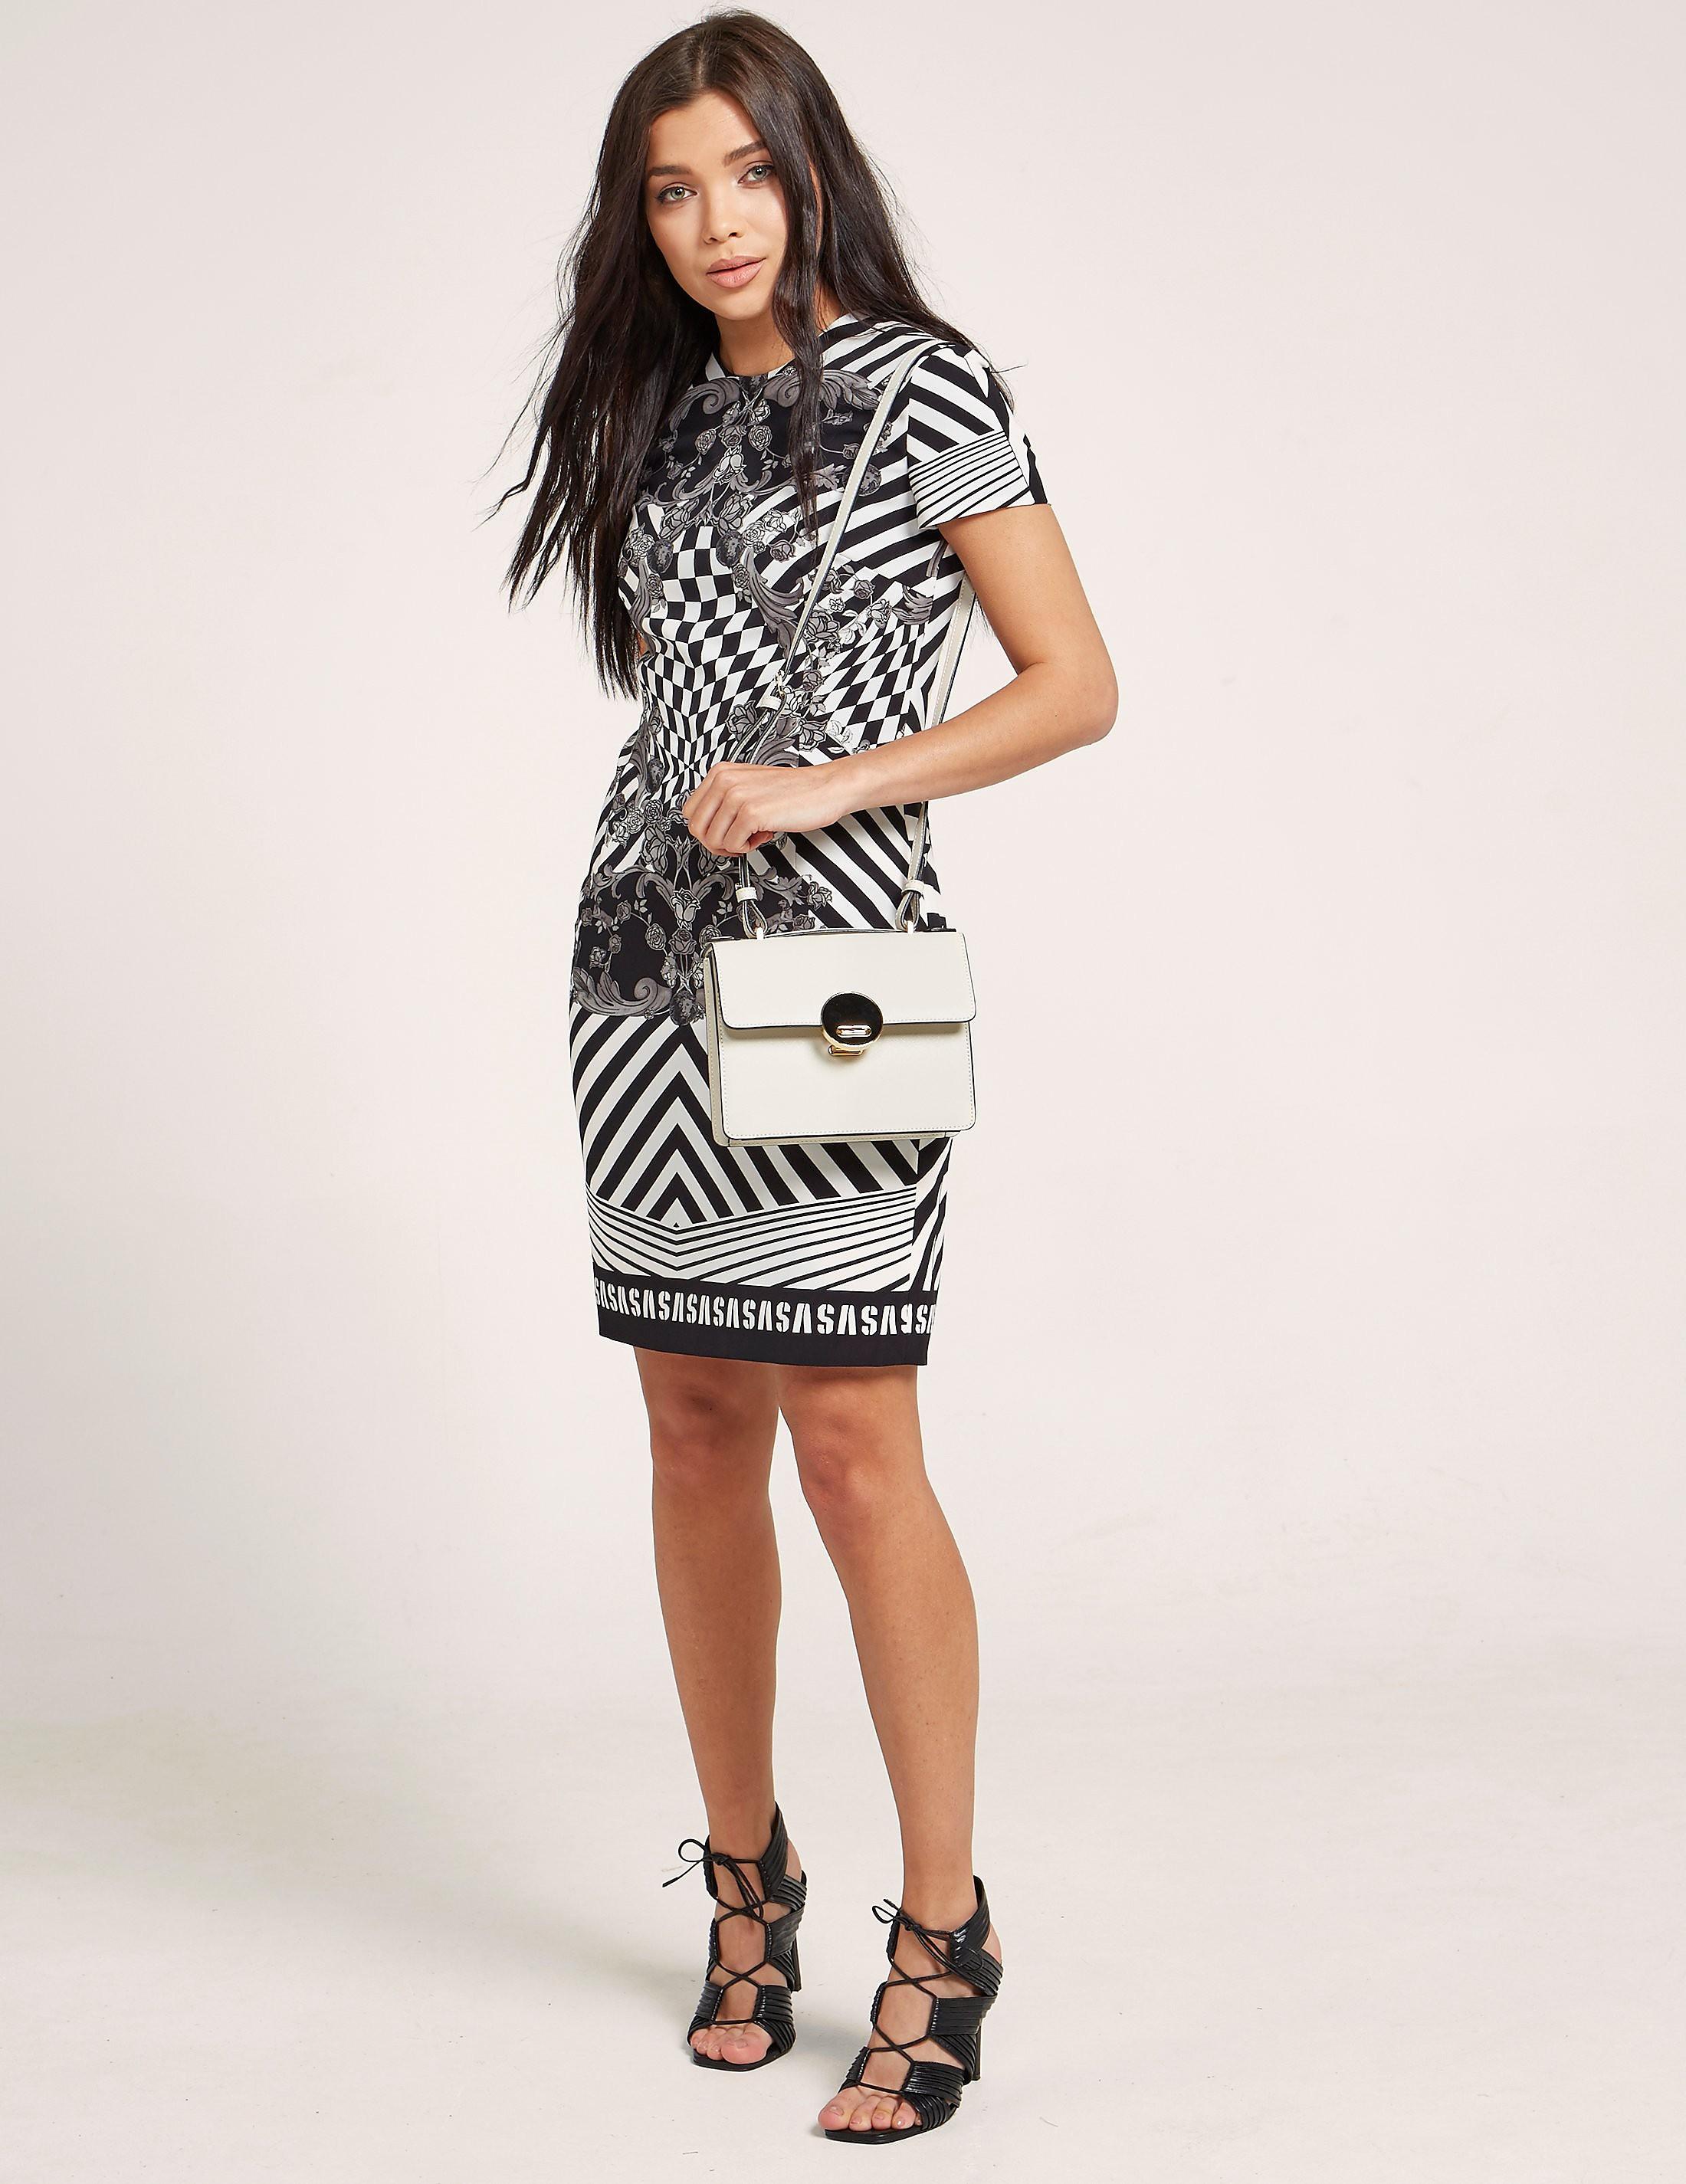 Versus Versace Optical Print Dress